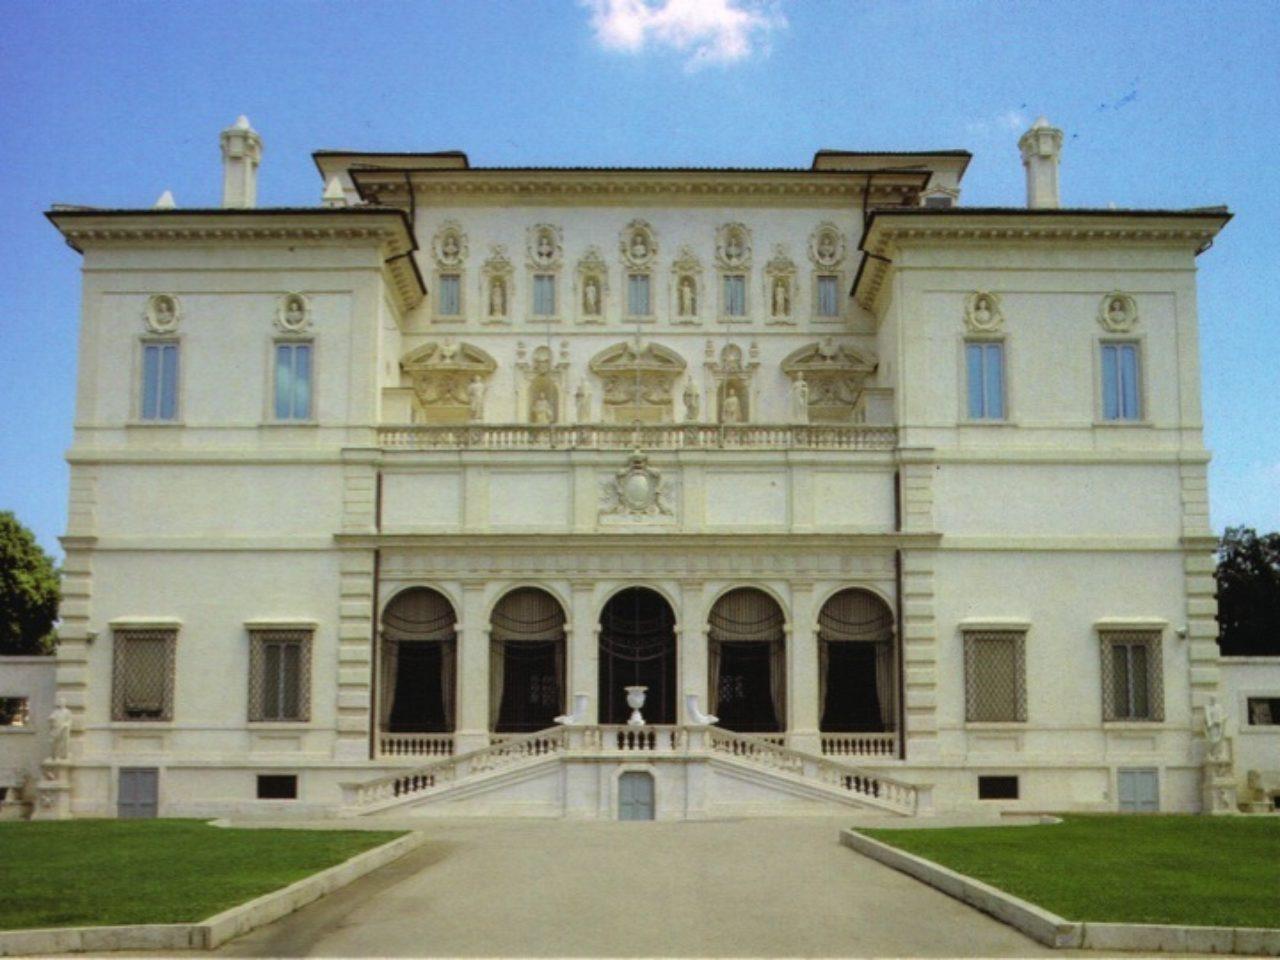 Villa Borghese (image source: CeCe Haydock Lecture)